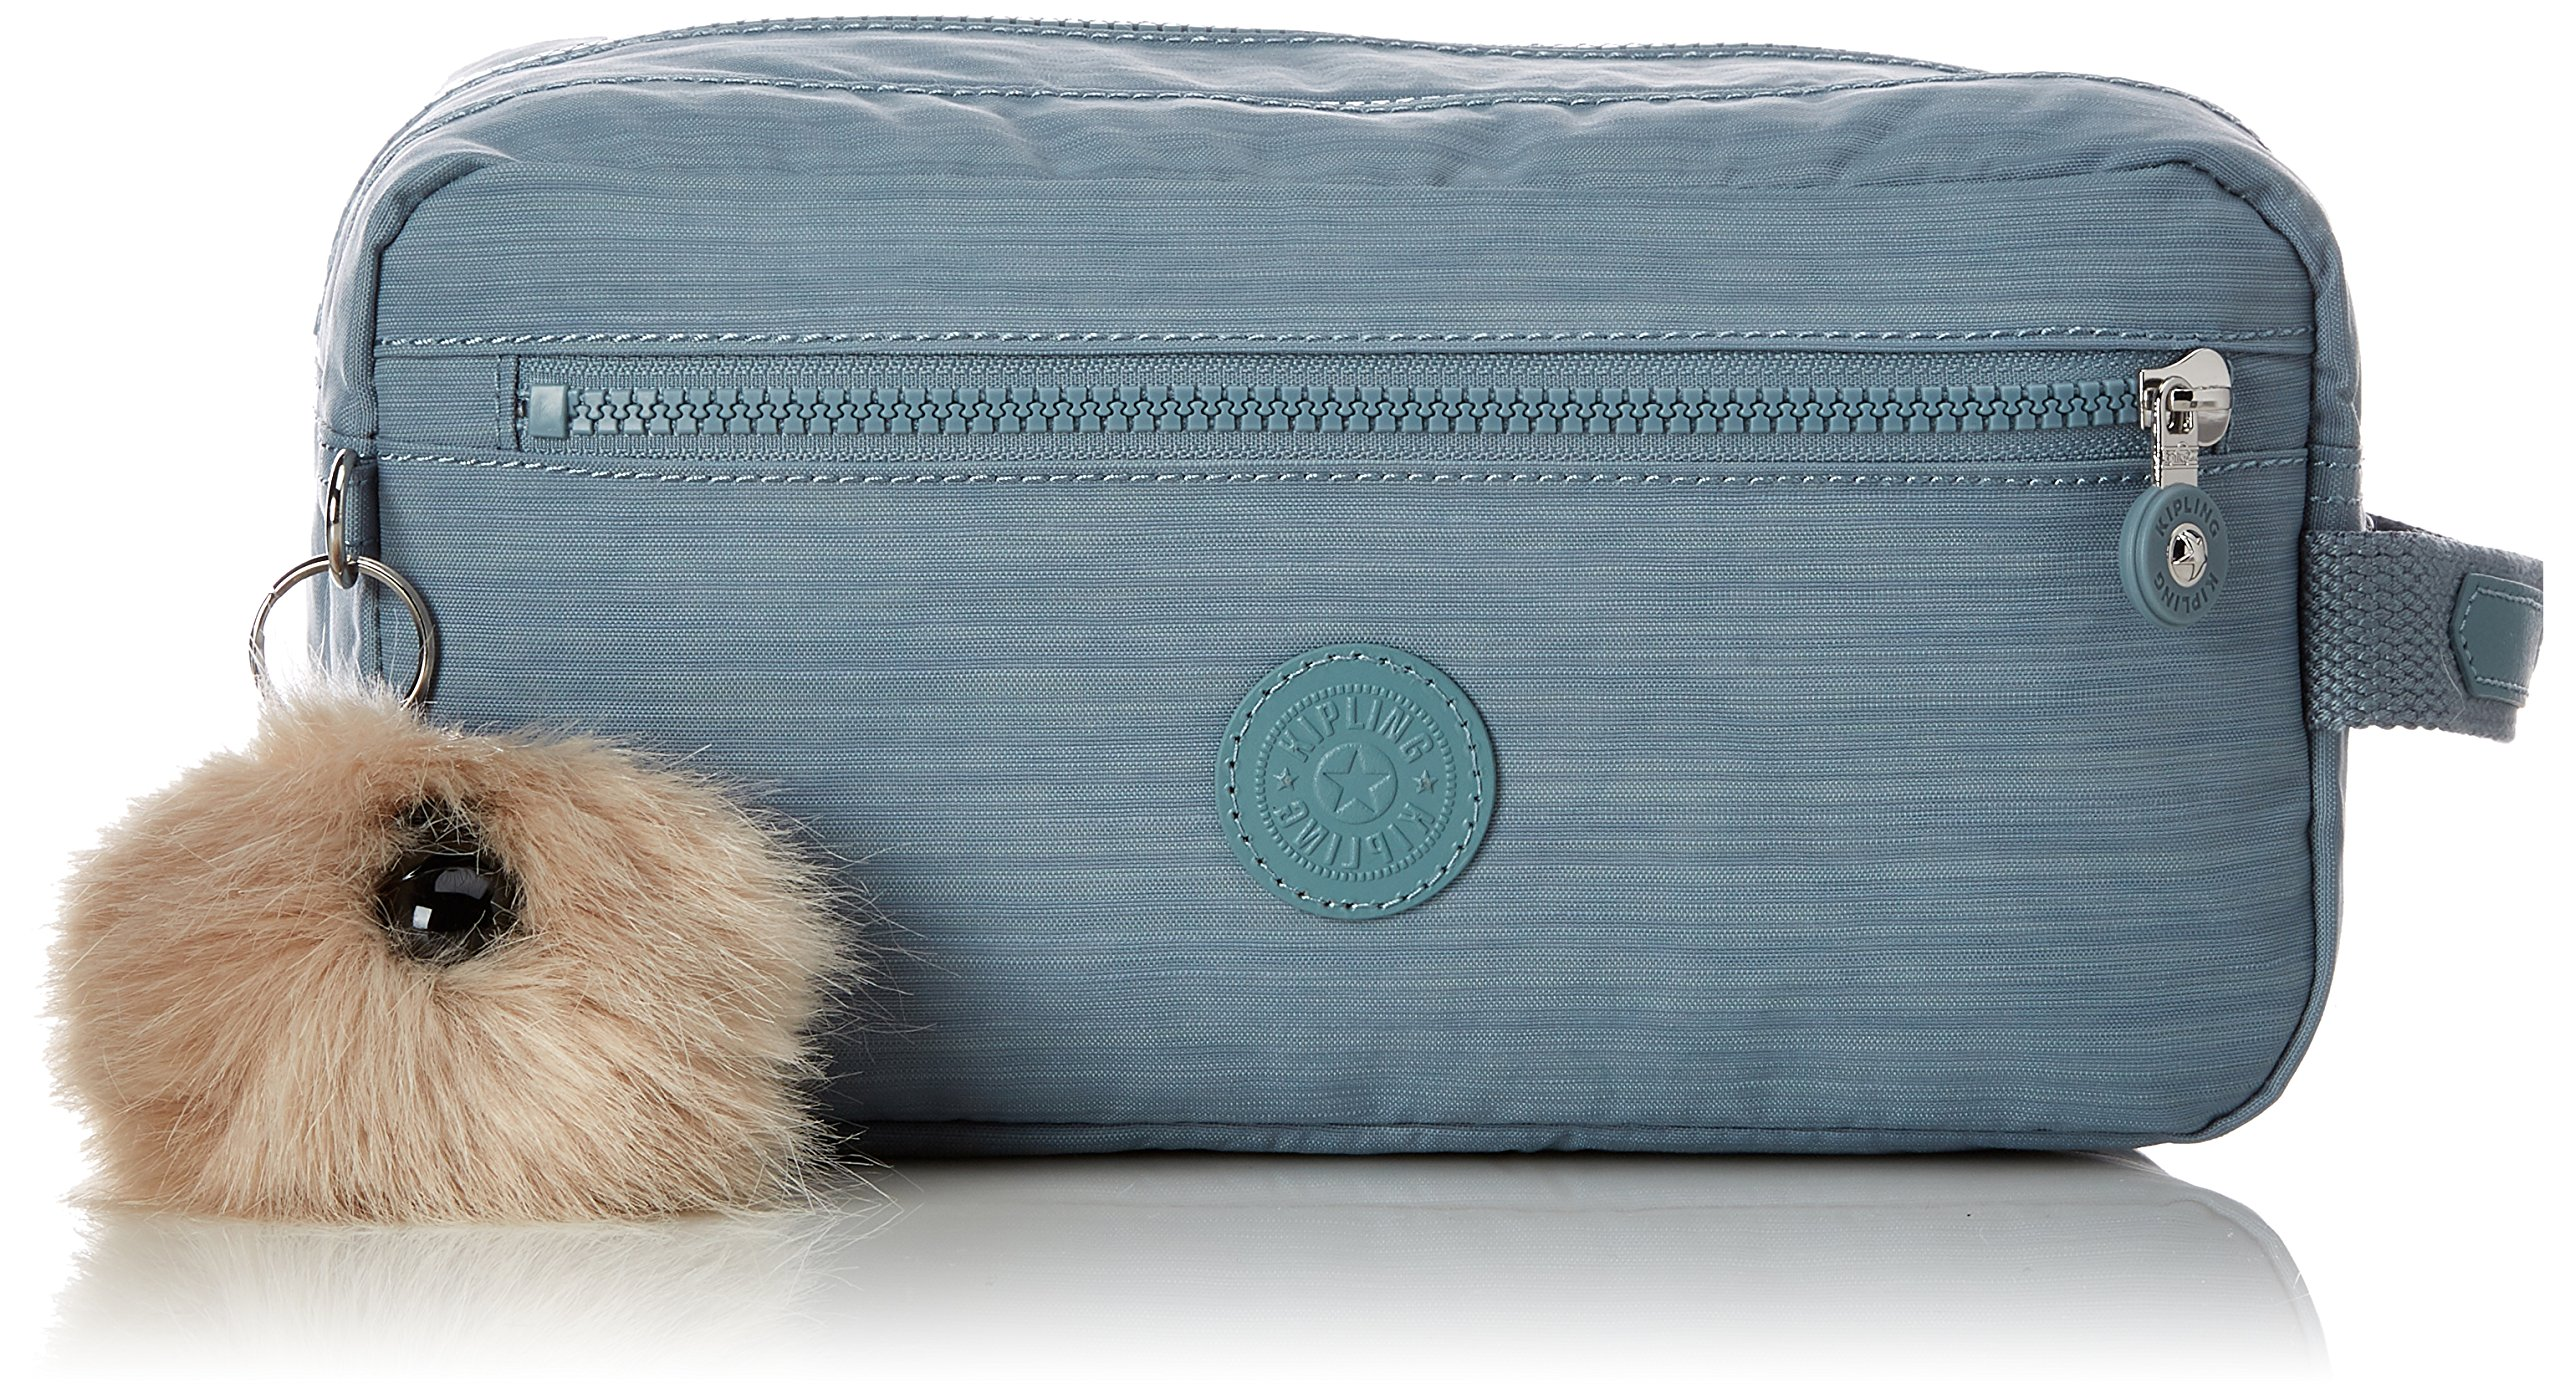 Kipling AGOT Bolsa de aseo, 26 cm, 3 litros